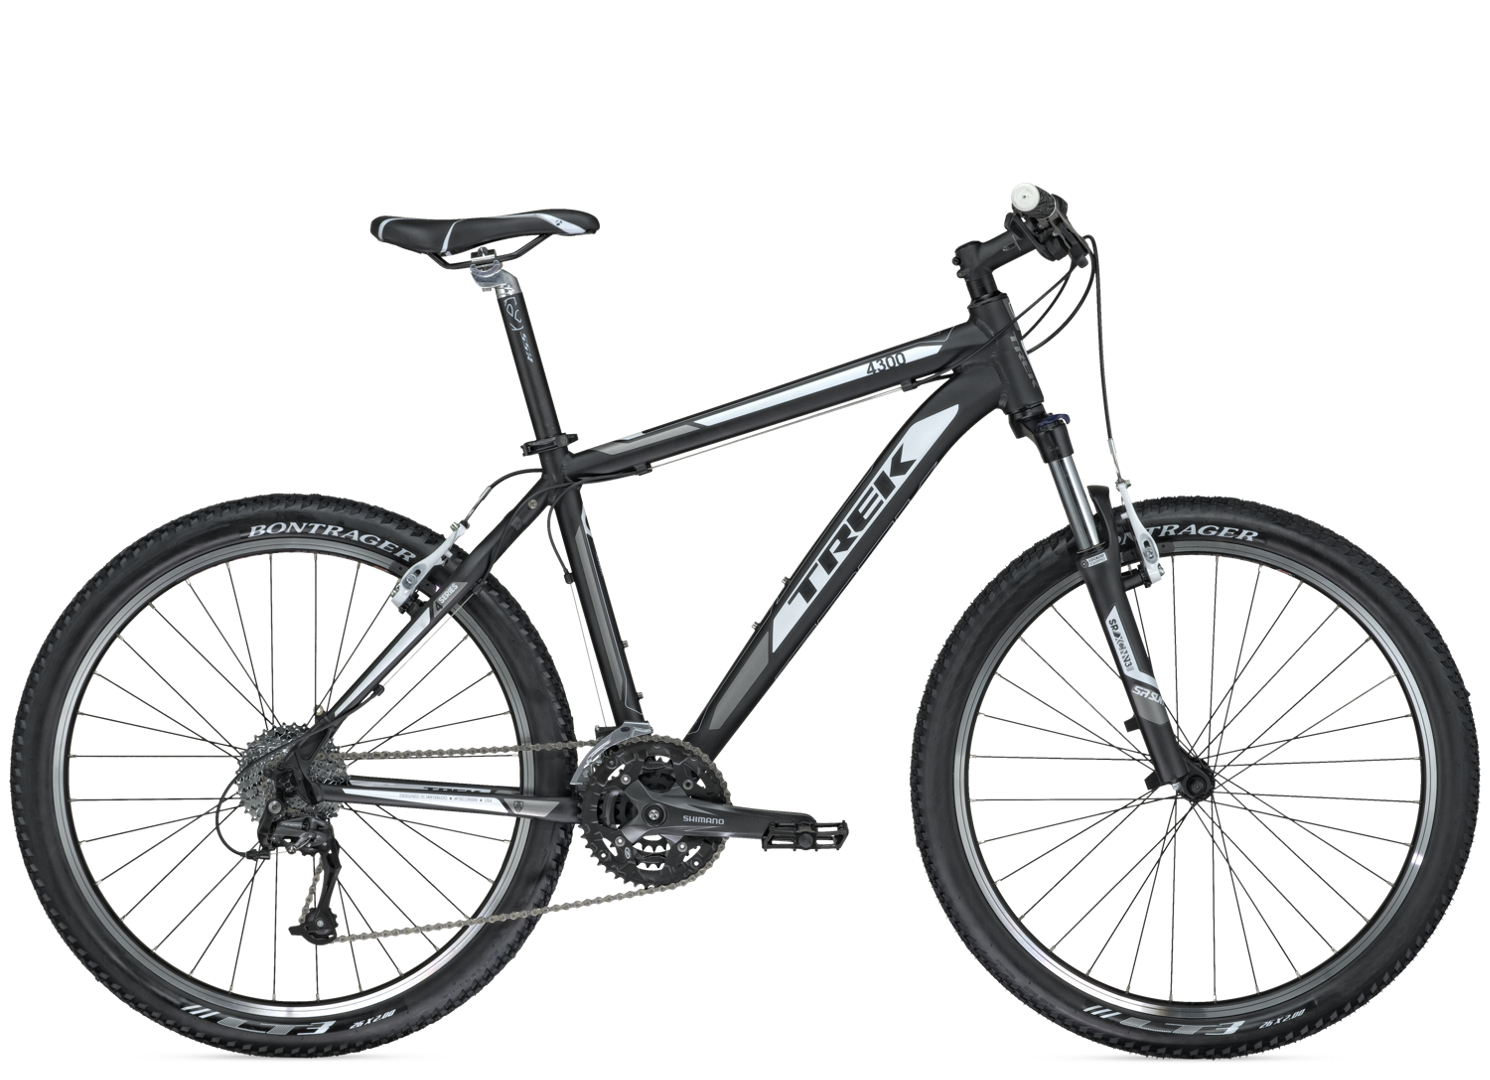 2012 4300 Bike Archive Trek Bicycle Threadless Headset Diagram